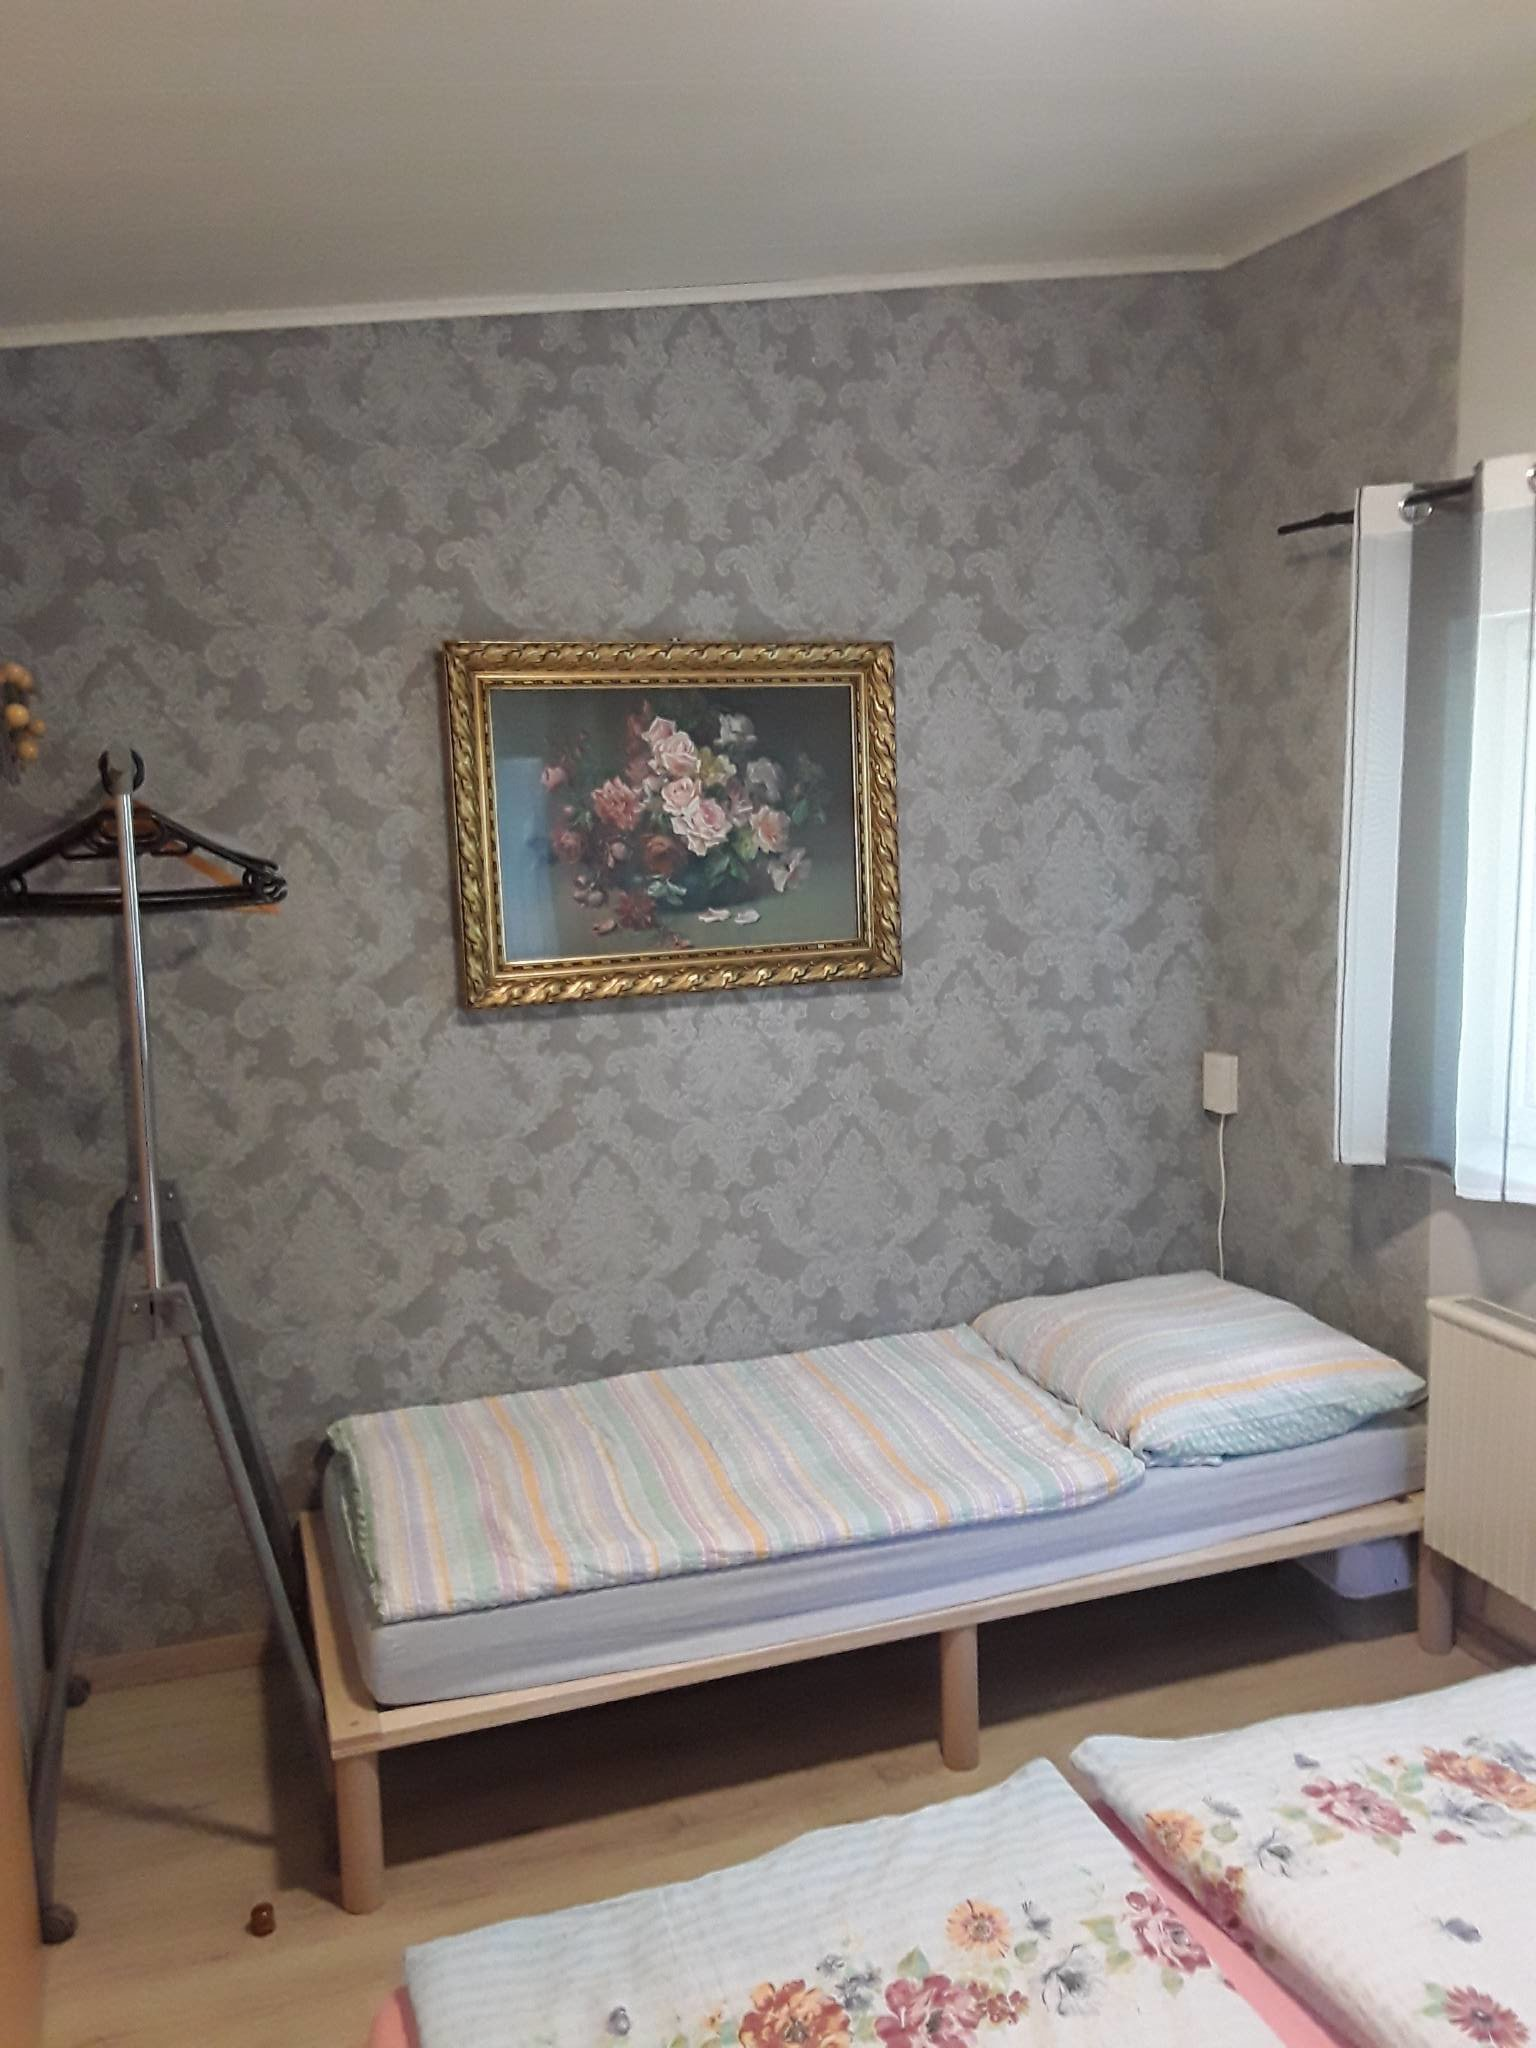 Fliegenschutzgittern Betten Günstig Online Kaufen — Rulmeca Germany